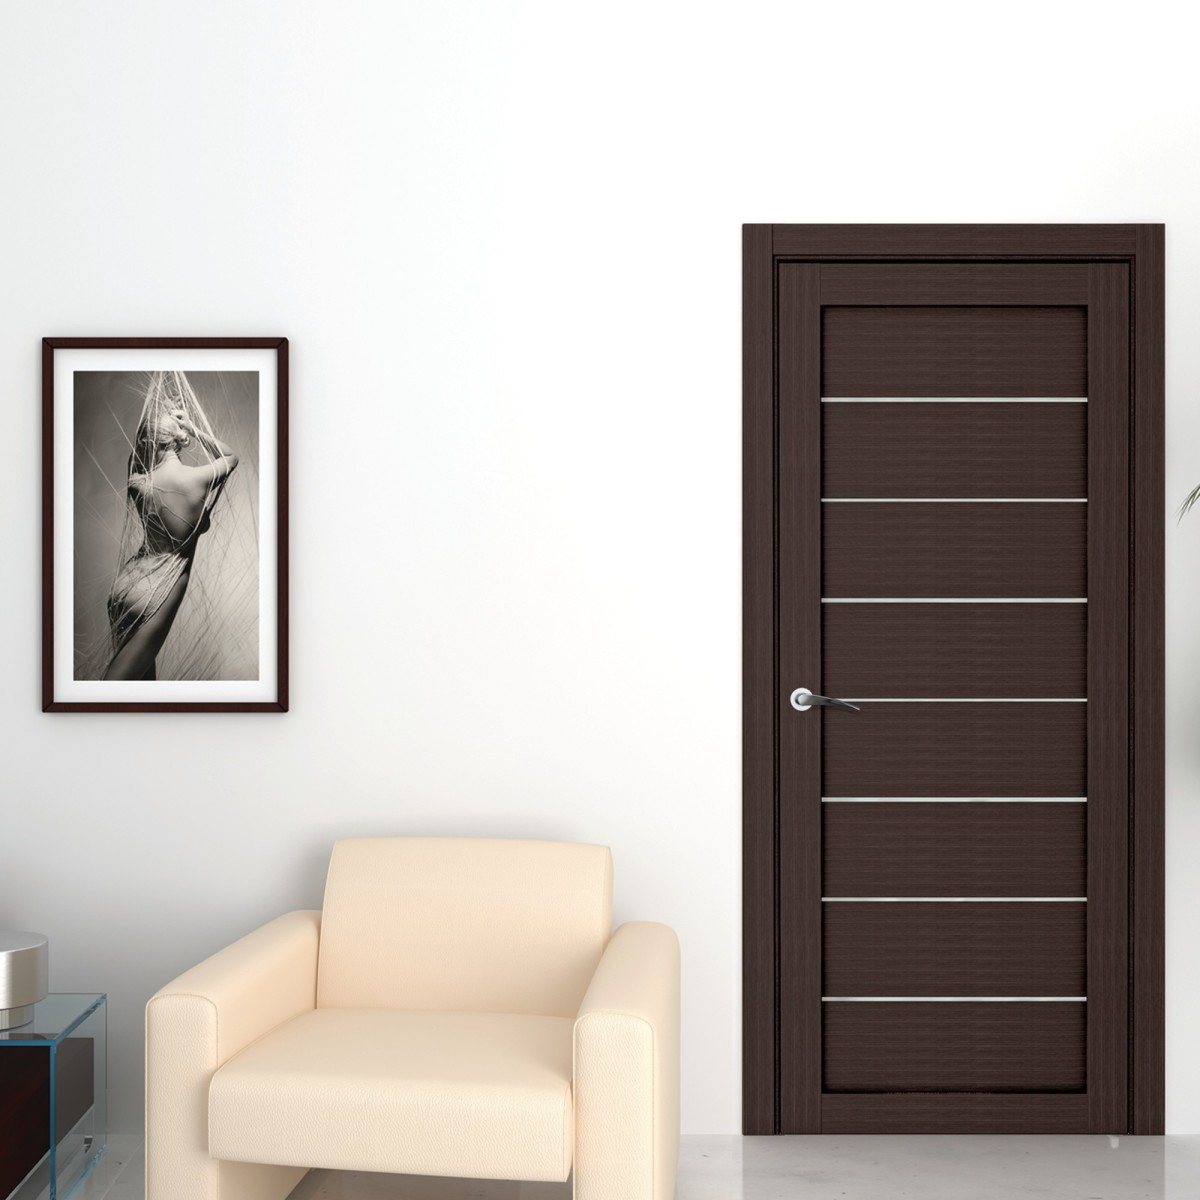 Дверь Межкомнатная Глухая Сабрина 80x200 Ламинация Цвет Мокко С Фурнитурой